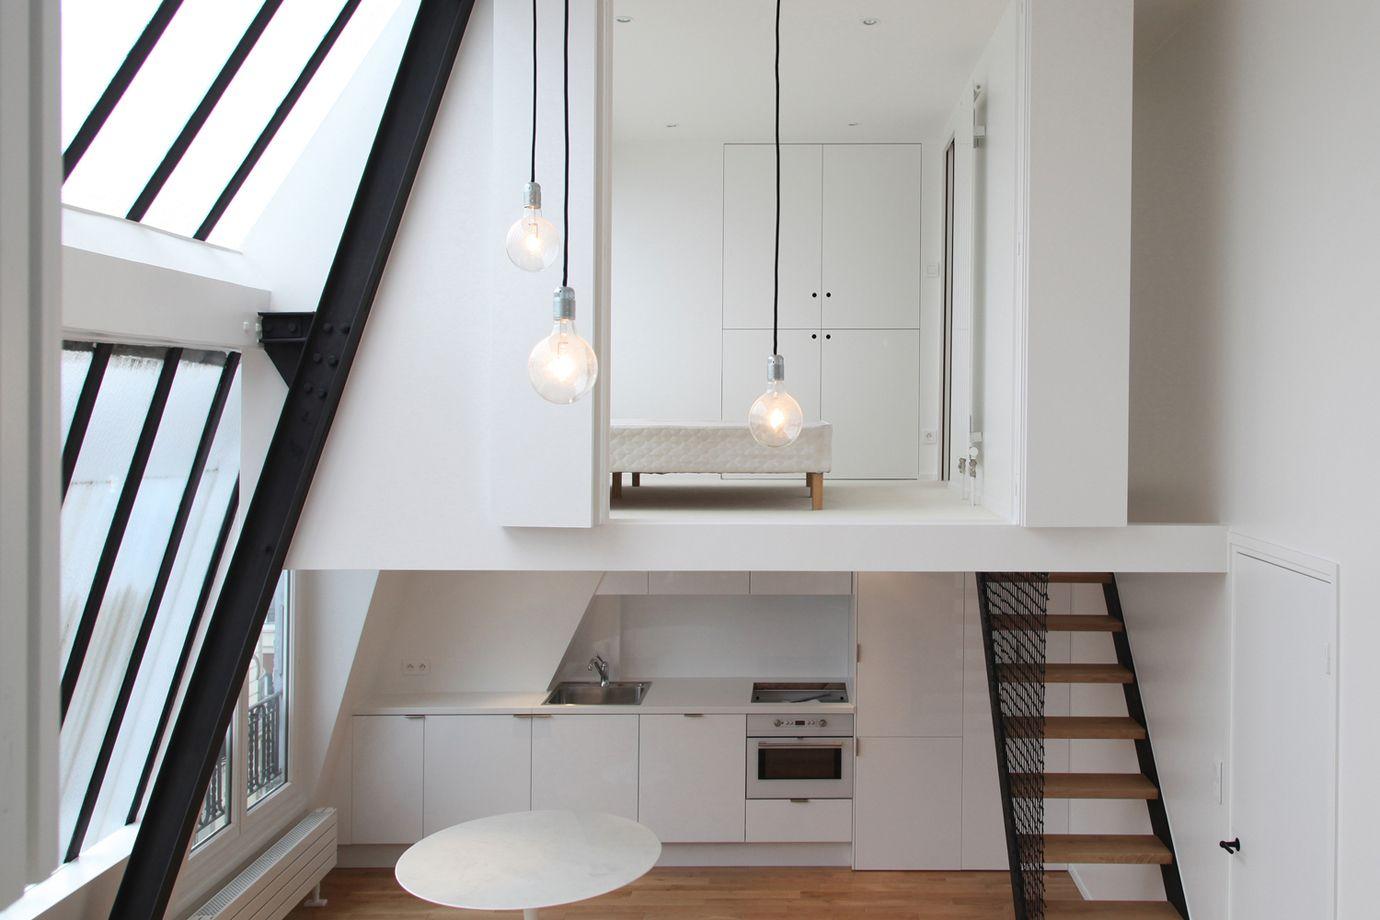 Studio Loft Apartment In Paris With Two Symmetrical Mezzanines